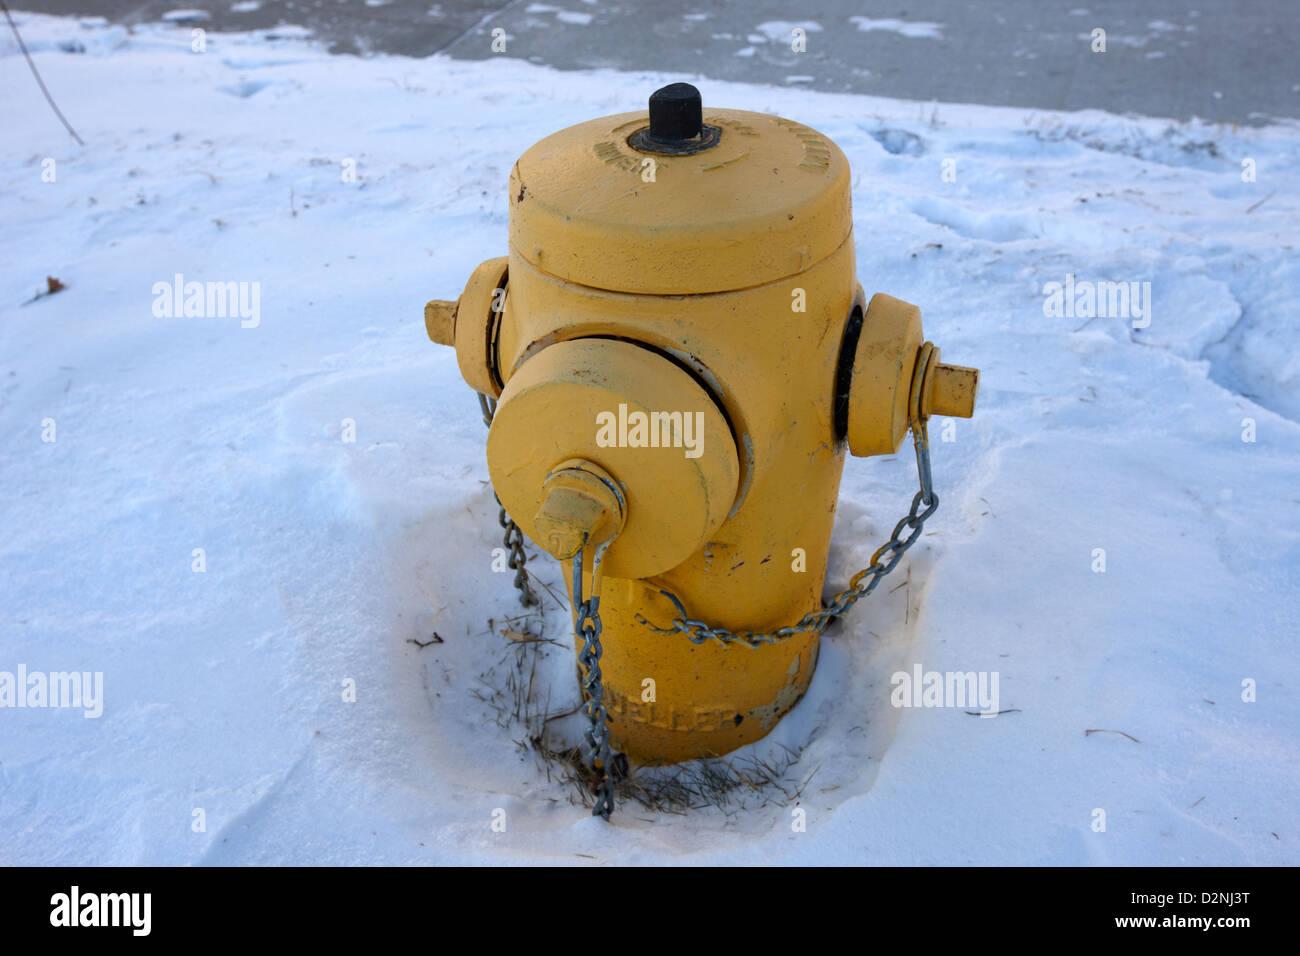 mueller yellow fire hydrant in the snow Saskatoon Saskatchewan Canada - Stock Image